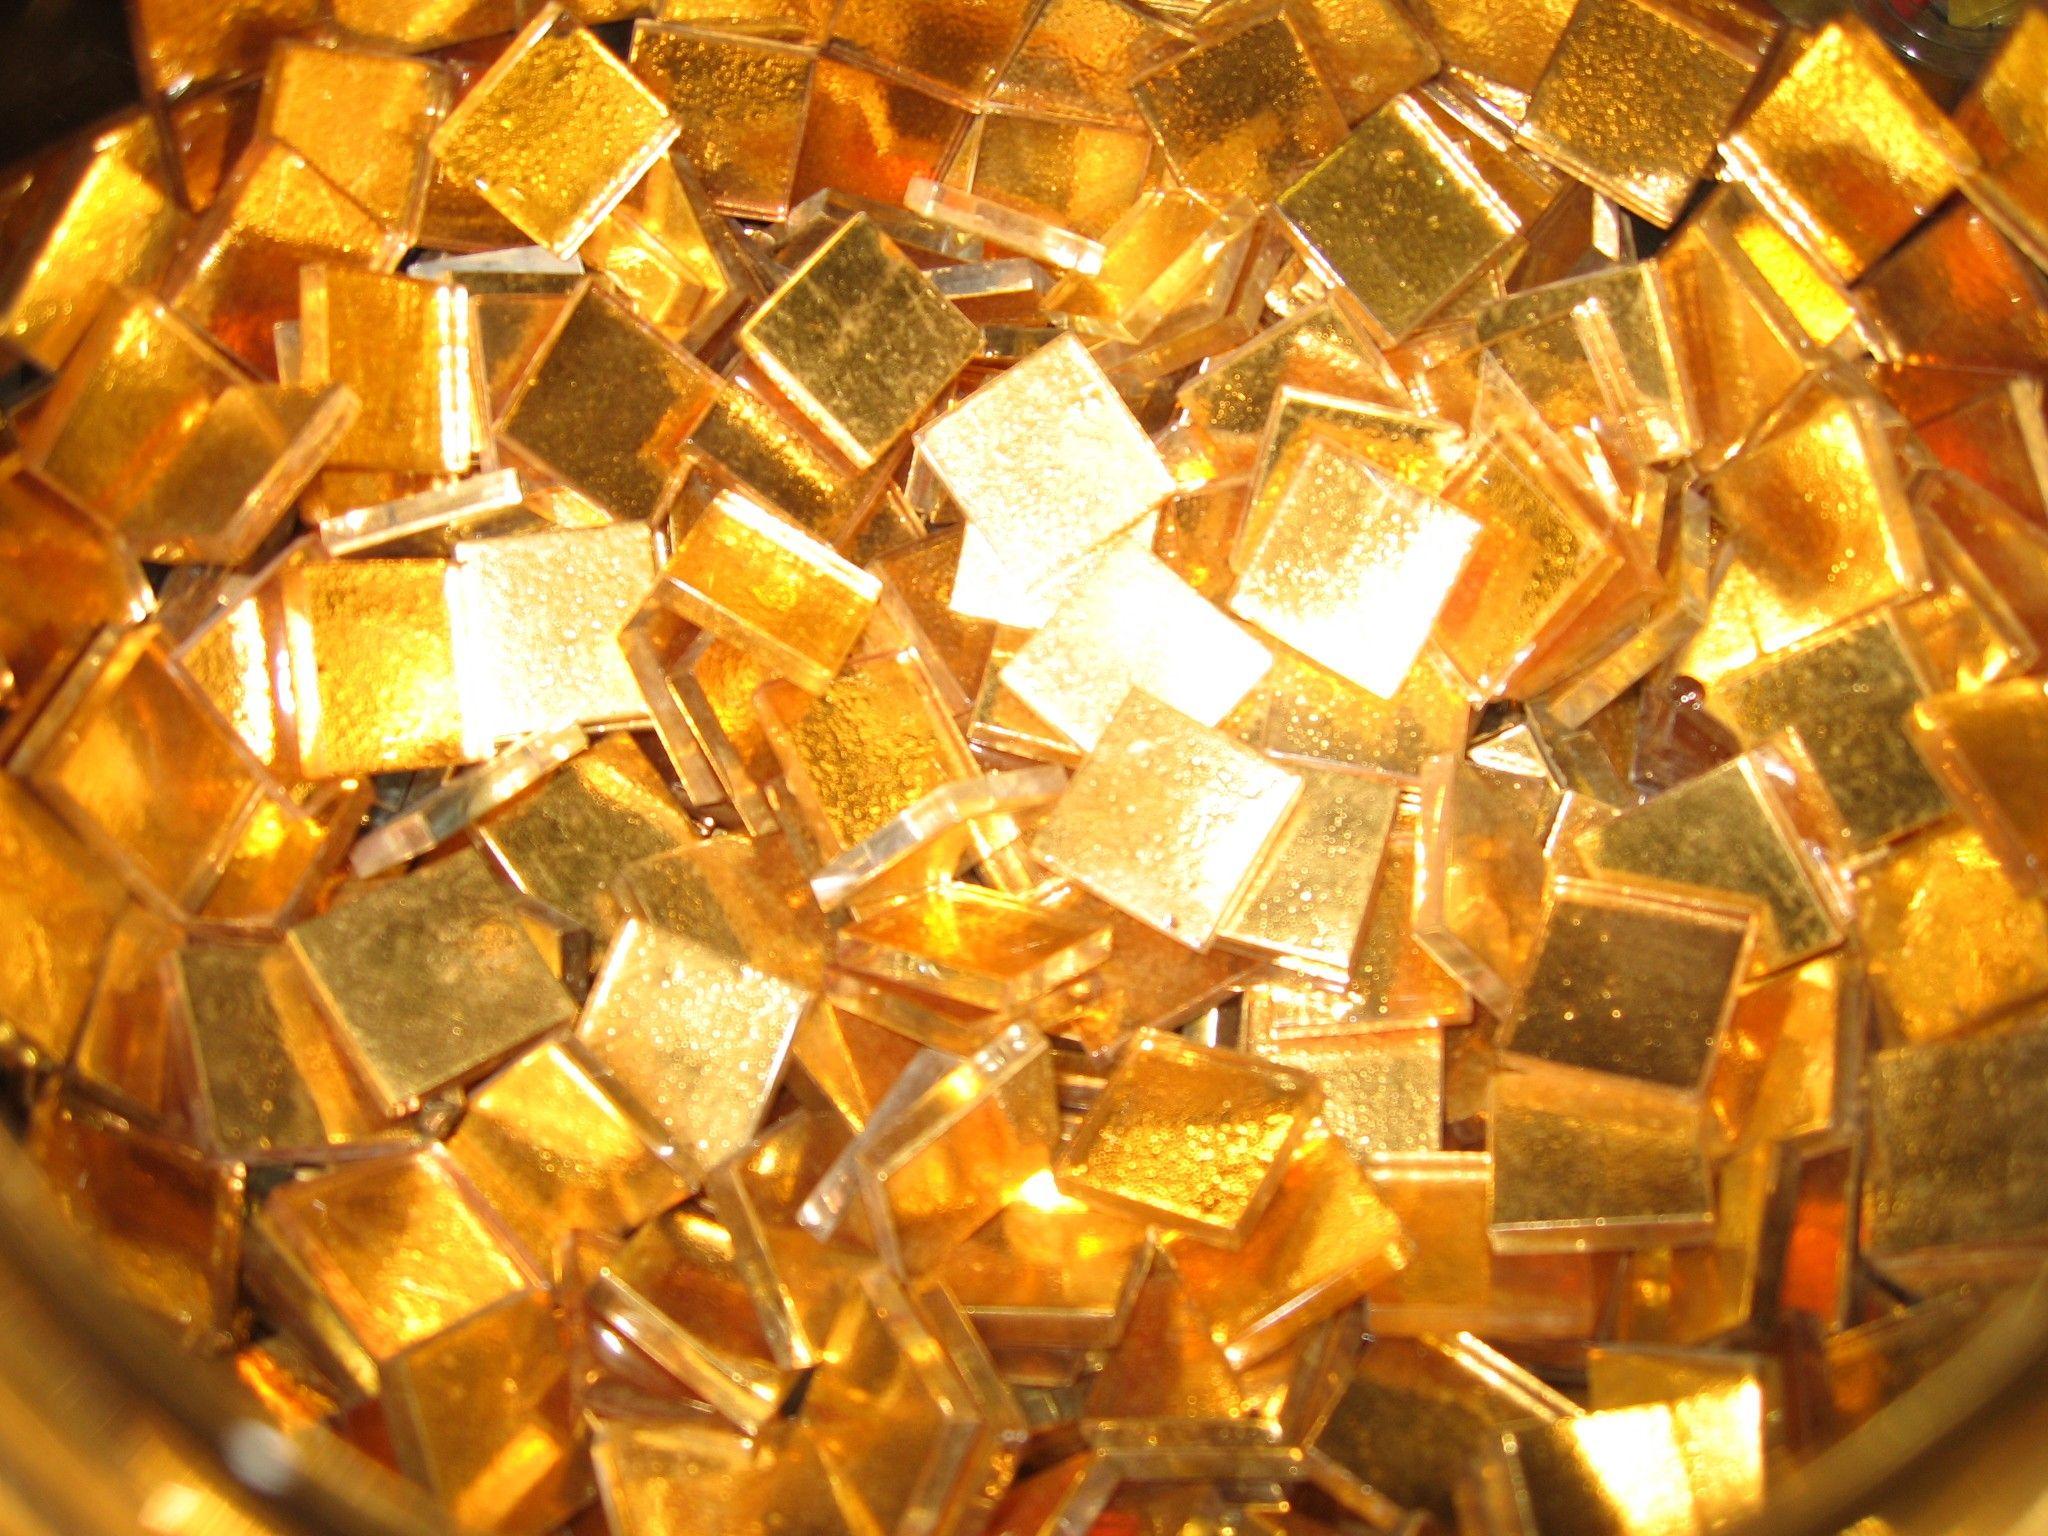 Цены на изделия из золота сегодня — Инвестиции в золото 841717c1e31